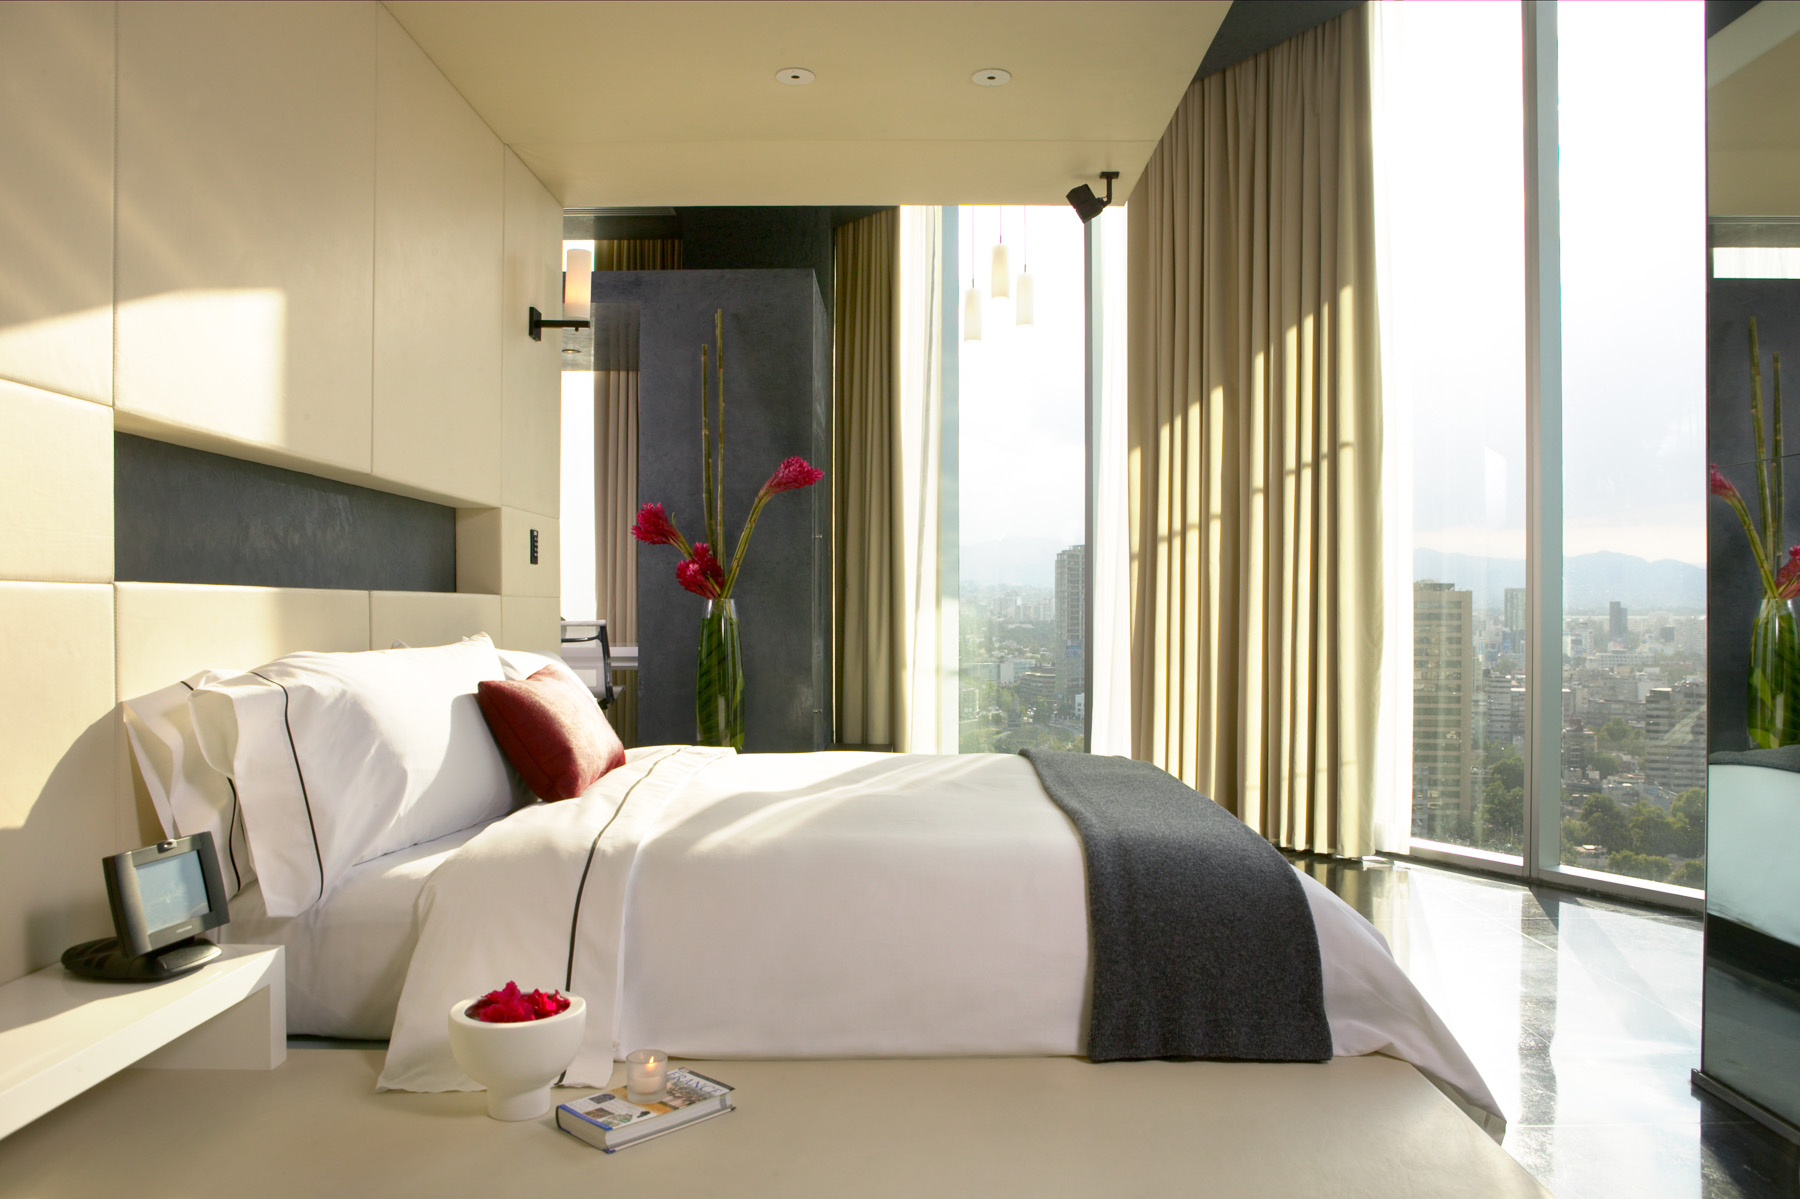 W Hotel - Mexico City